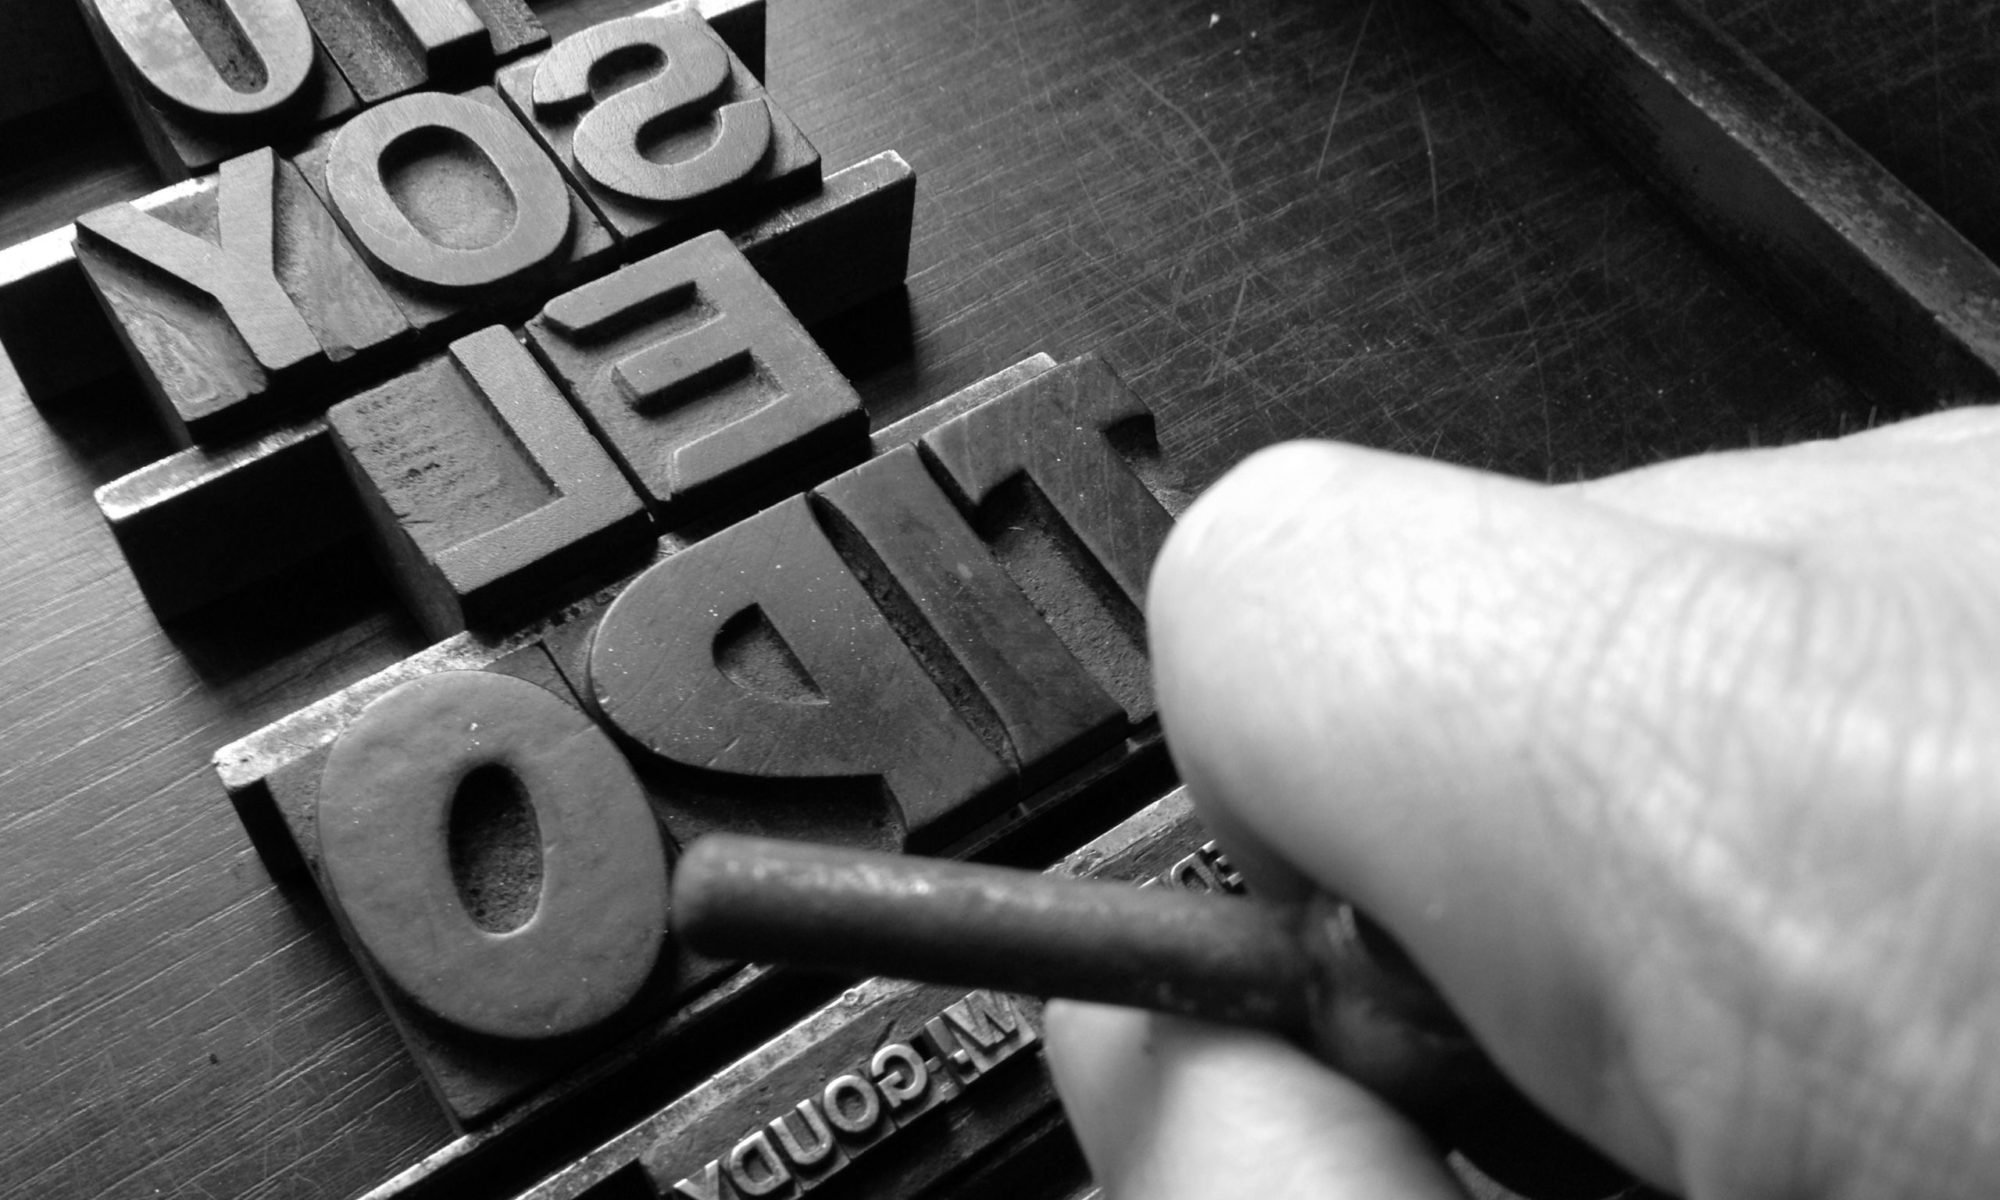 Caja Baja - Tipografía y Obra gráfica - Letterpress